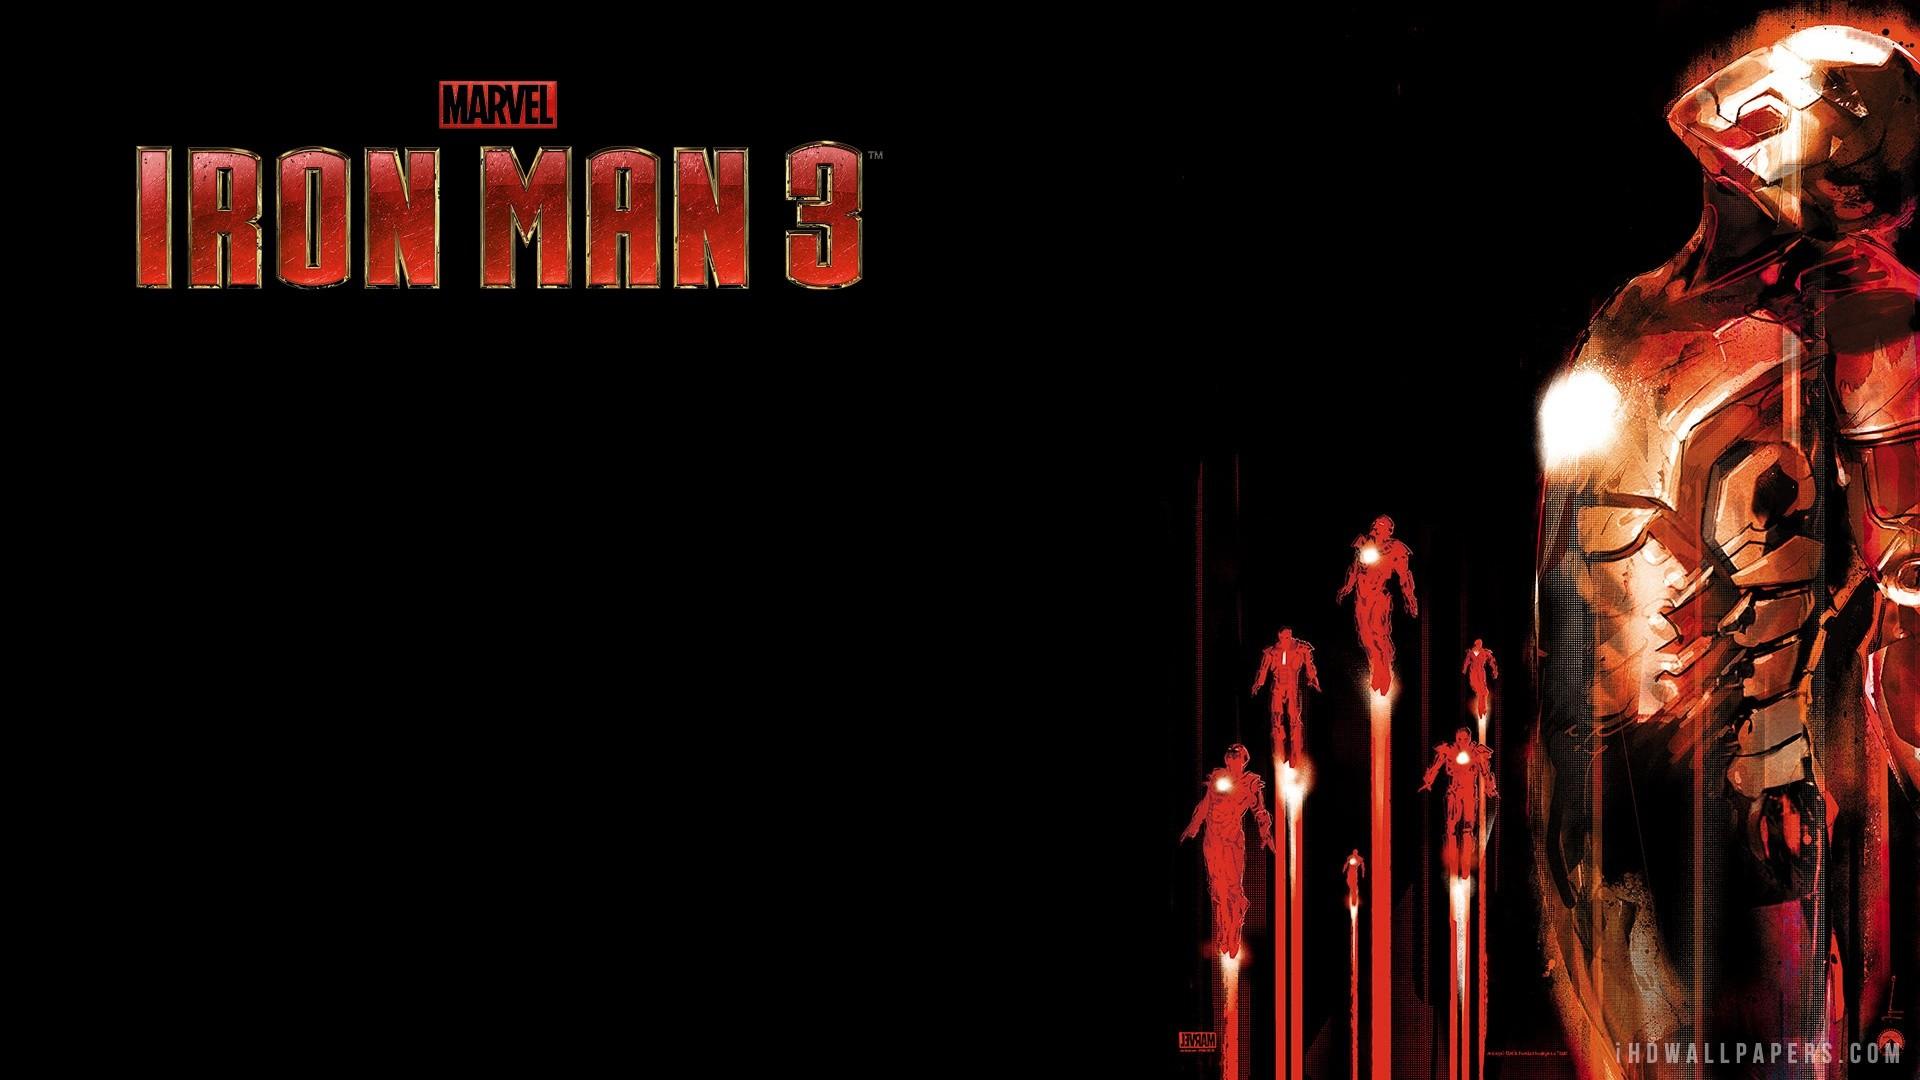 Iron Man 3 IMAX 3D HD 1080p Wallpapers